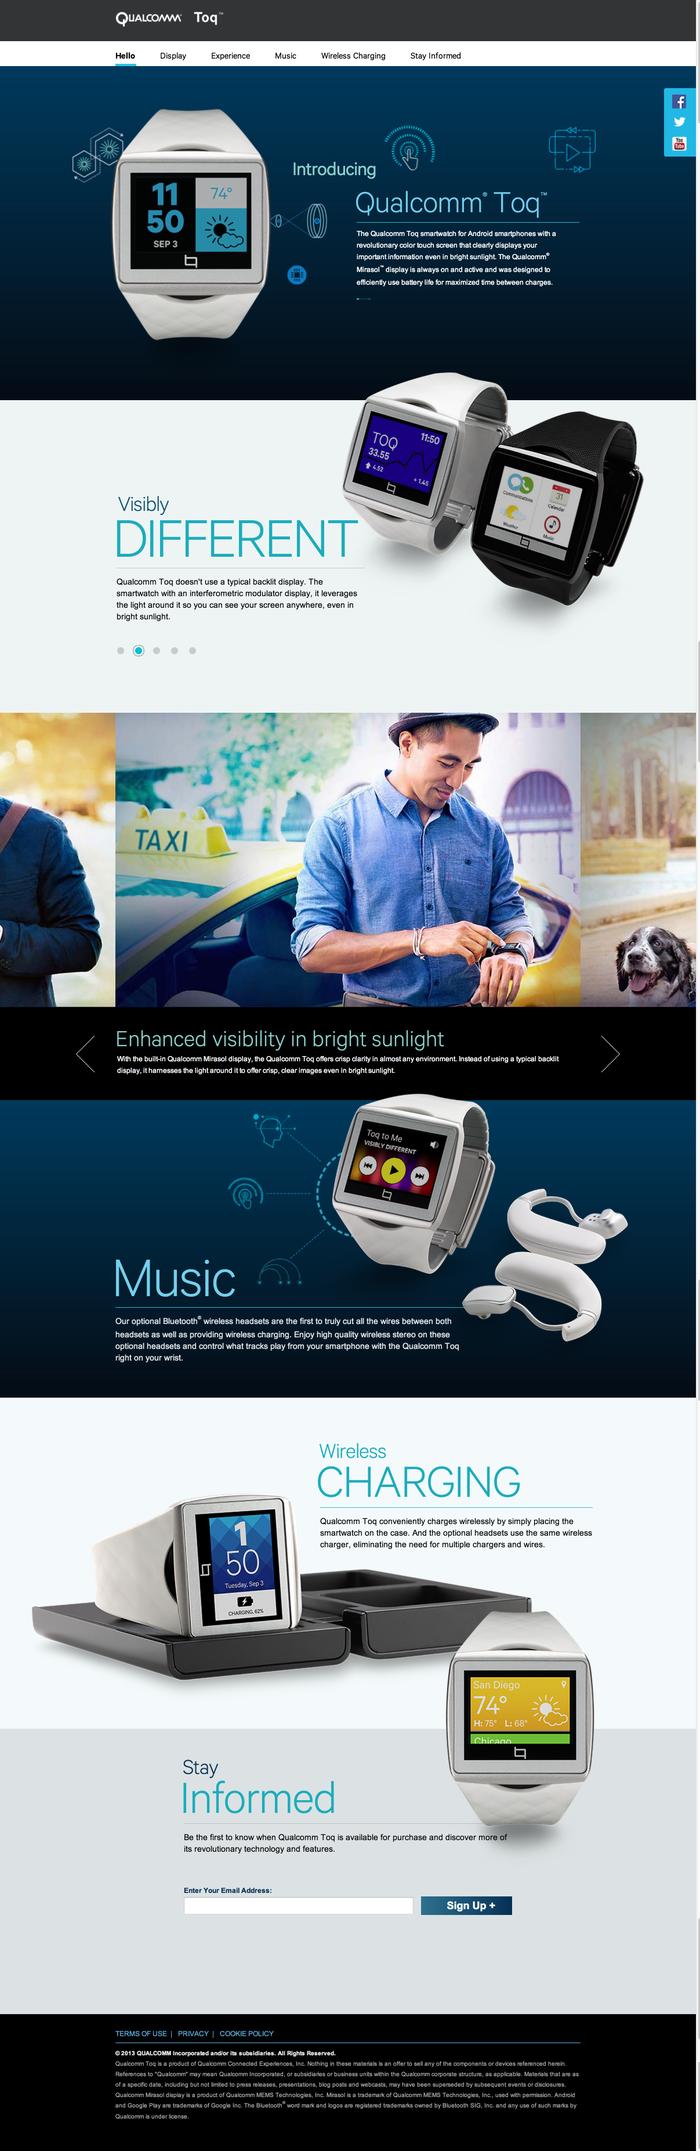 Qualcomm Toq Smartwatch.png